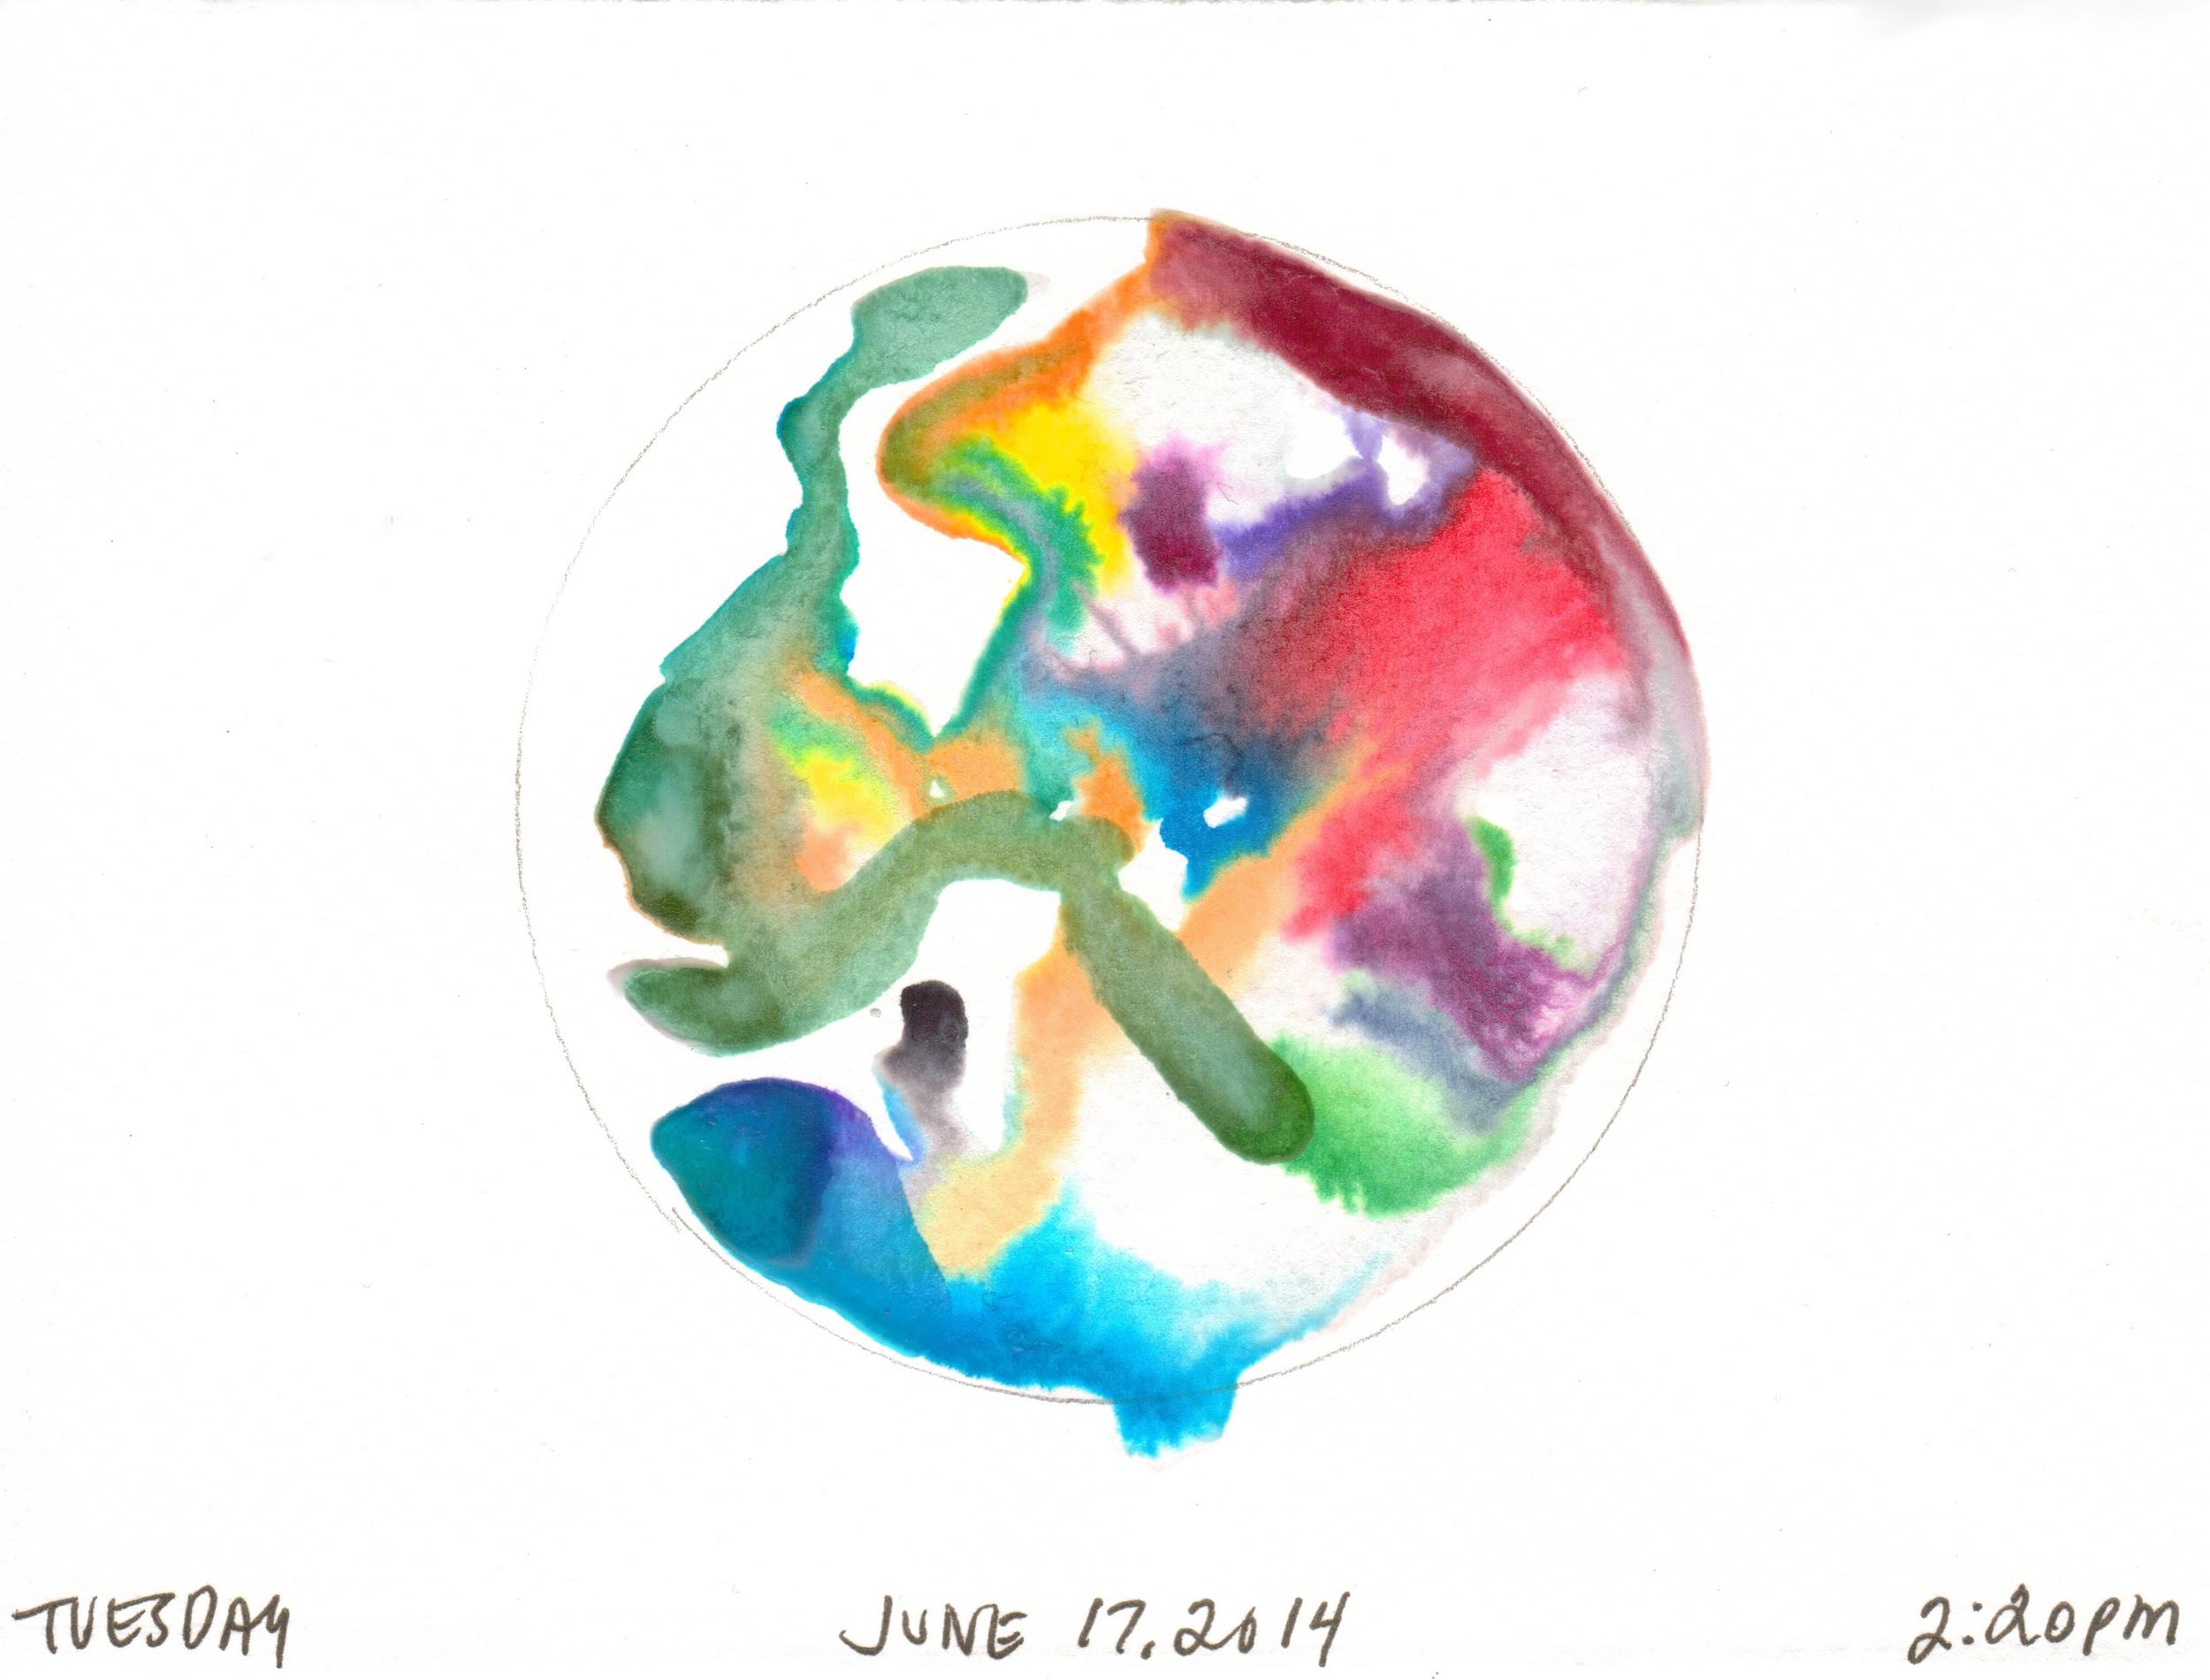 06.17.14